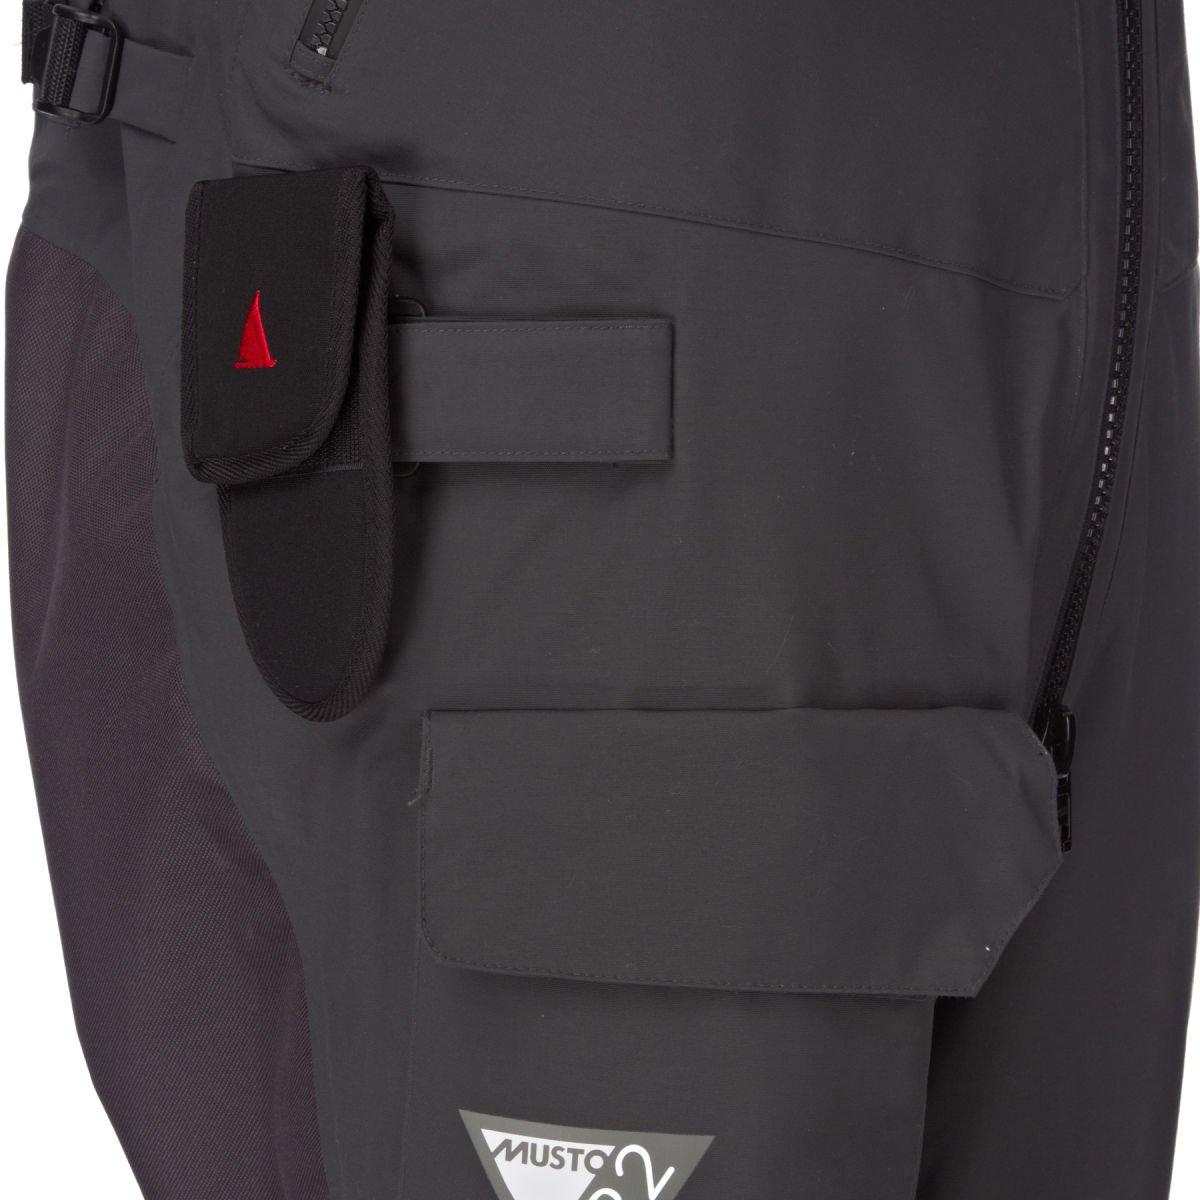 Musto BR2 Offshore Trouser Red//Dark Grey SB0042